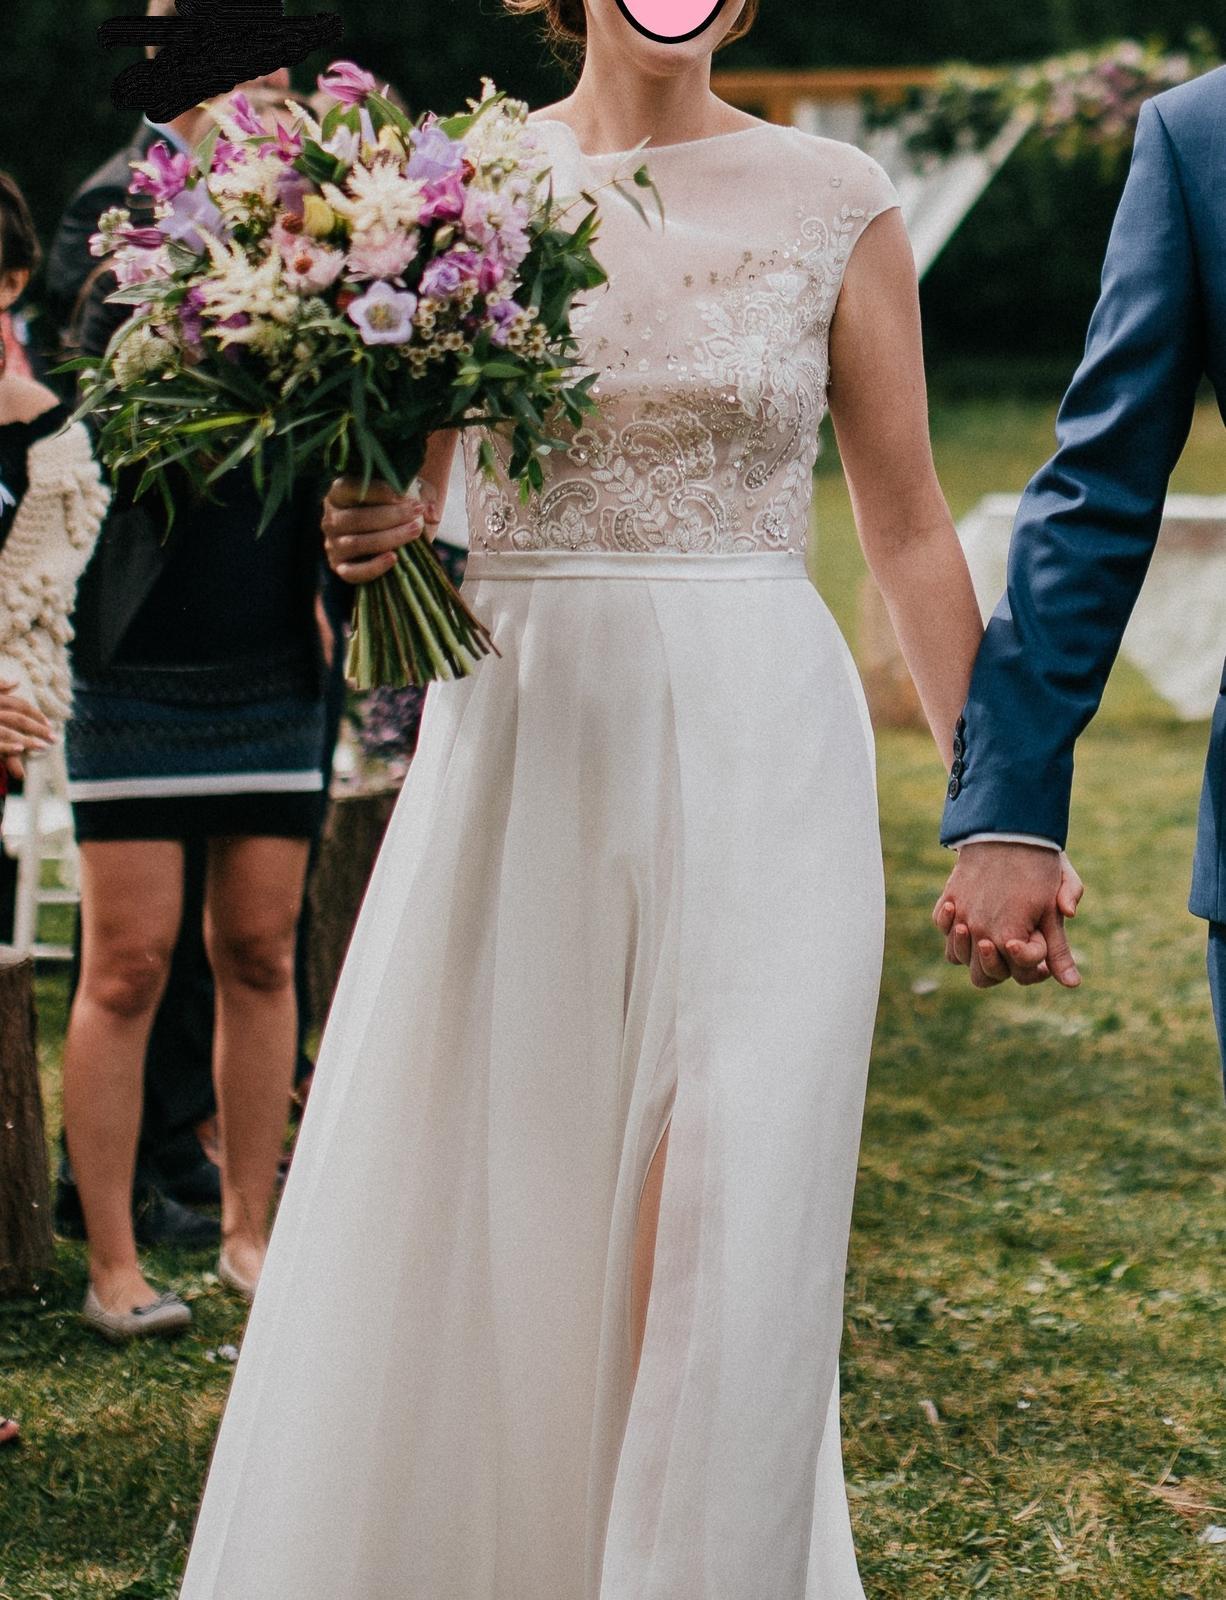 Lehké svatební šaty bez vad - Obrázek č. 1